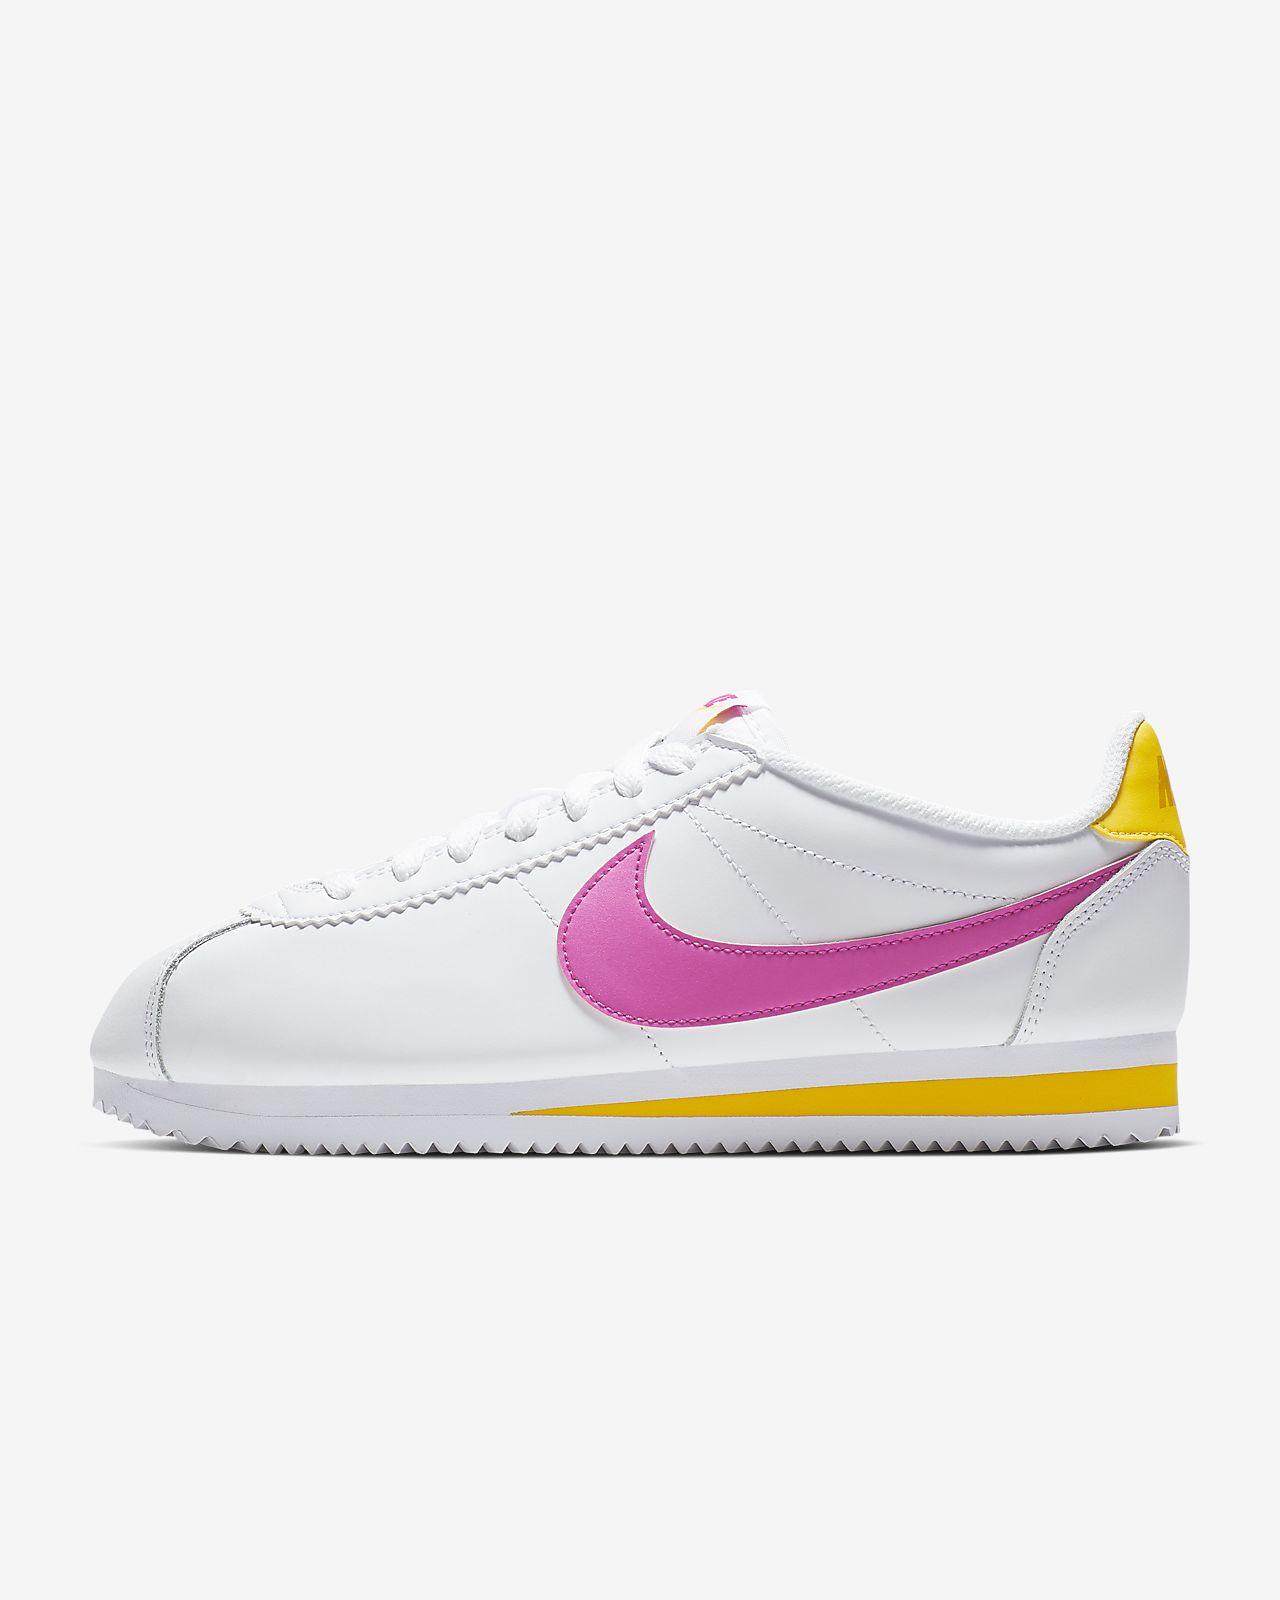 98f2109aed8e47 Low Resolution Nike Classic Cortez Damenschuh Nike Classic Cortez Damenschuh